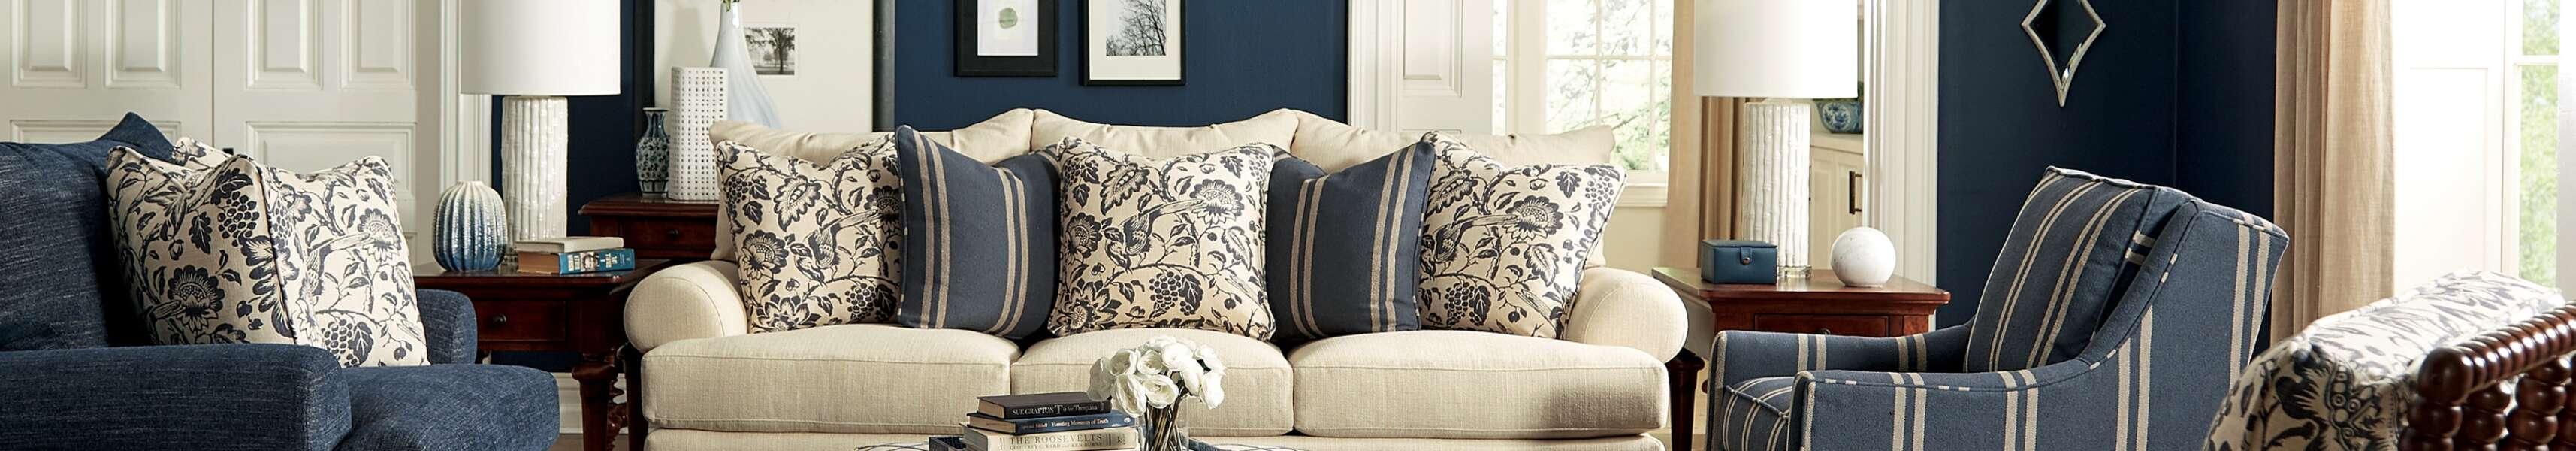 Simple Office Room Design, Paula Deen Home Furniture Wayfair